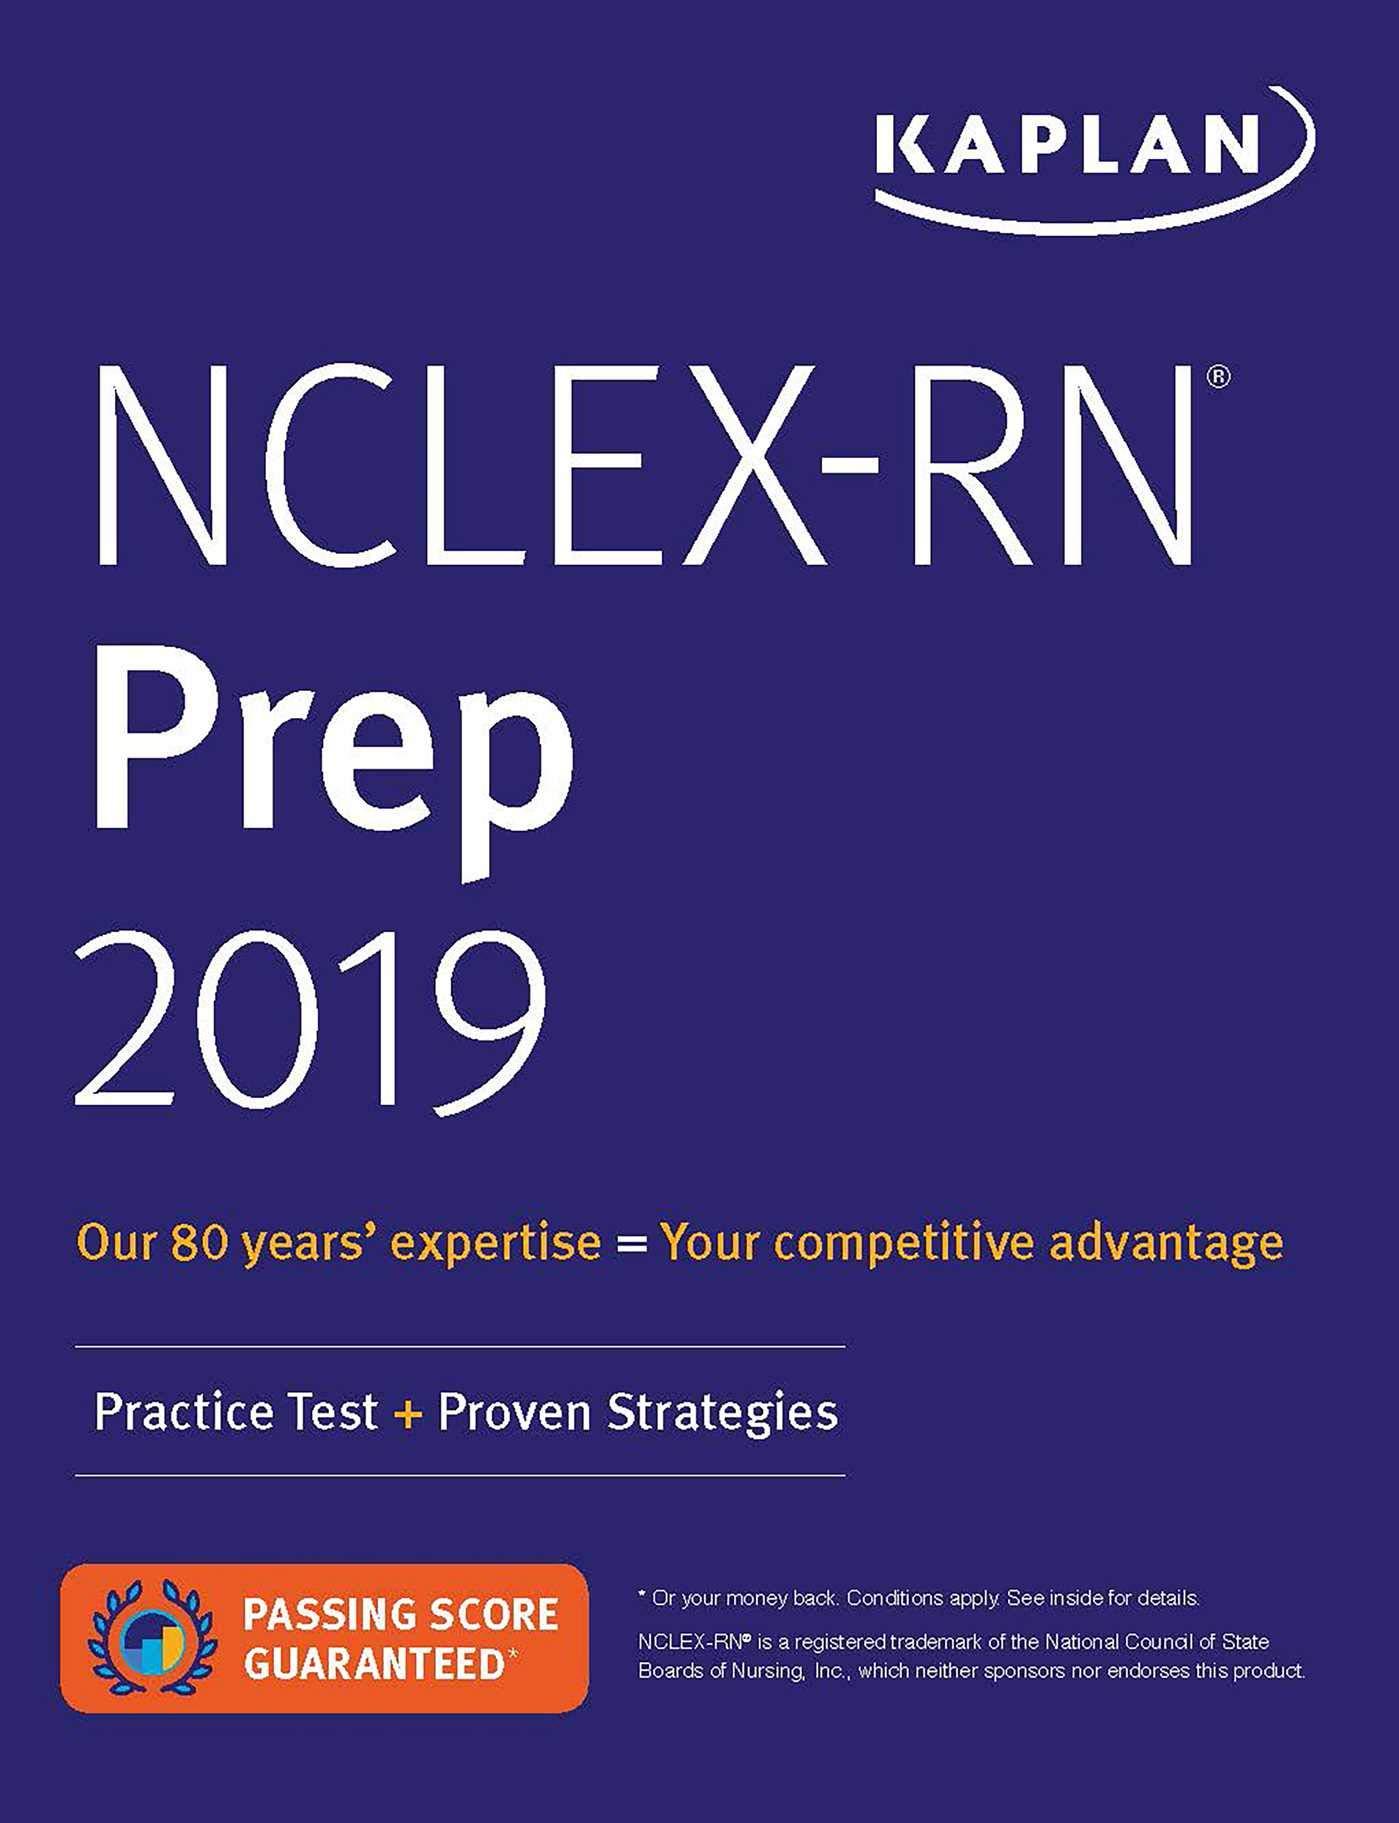 NCLEX RN Prep 2019  Practice Test + Proven Strategies  Kaplan Test Prep